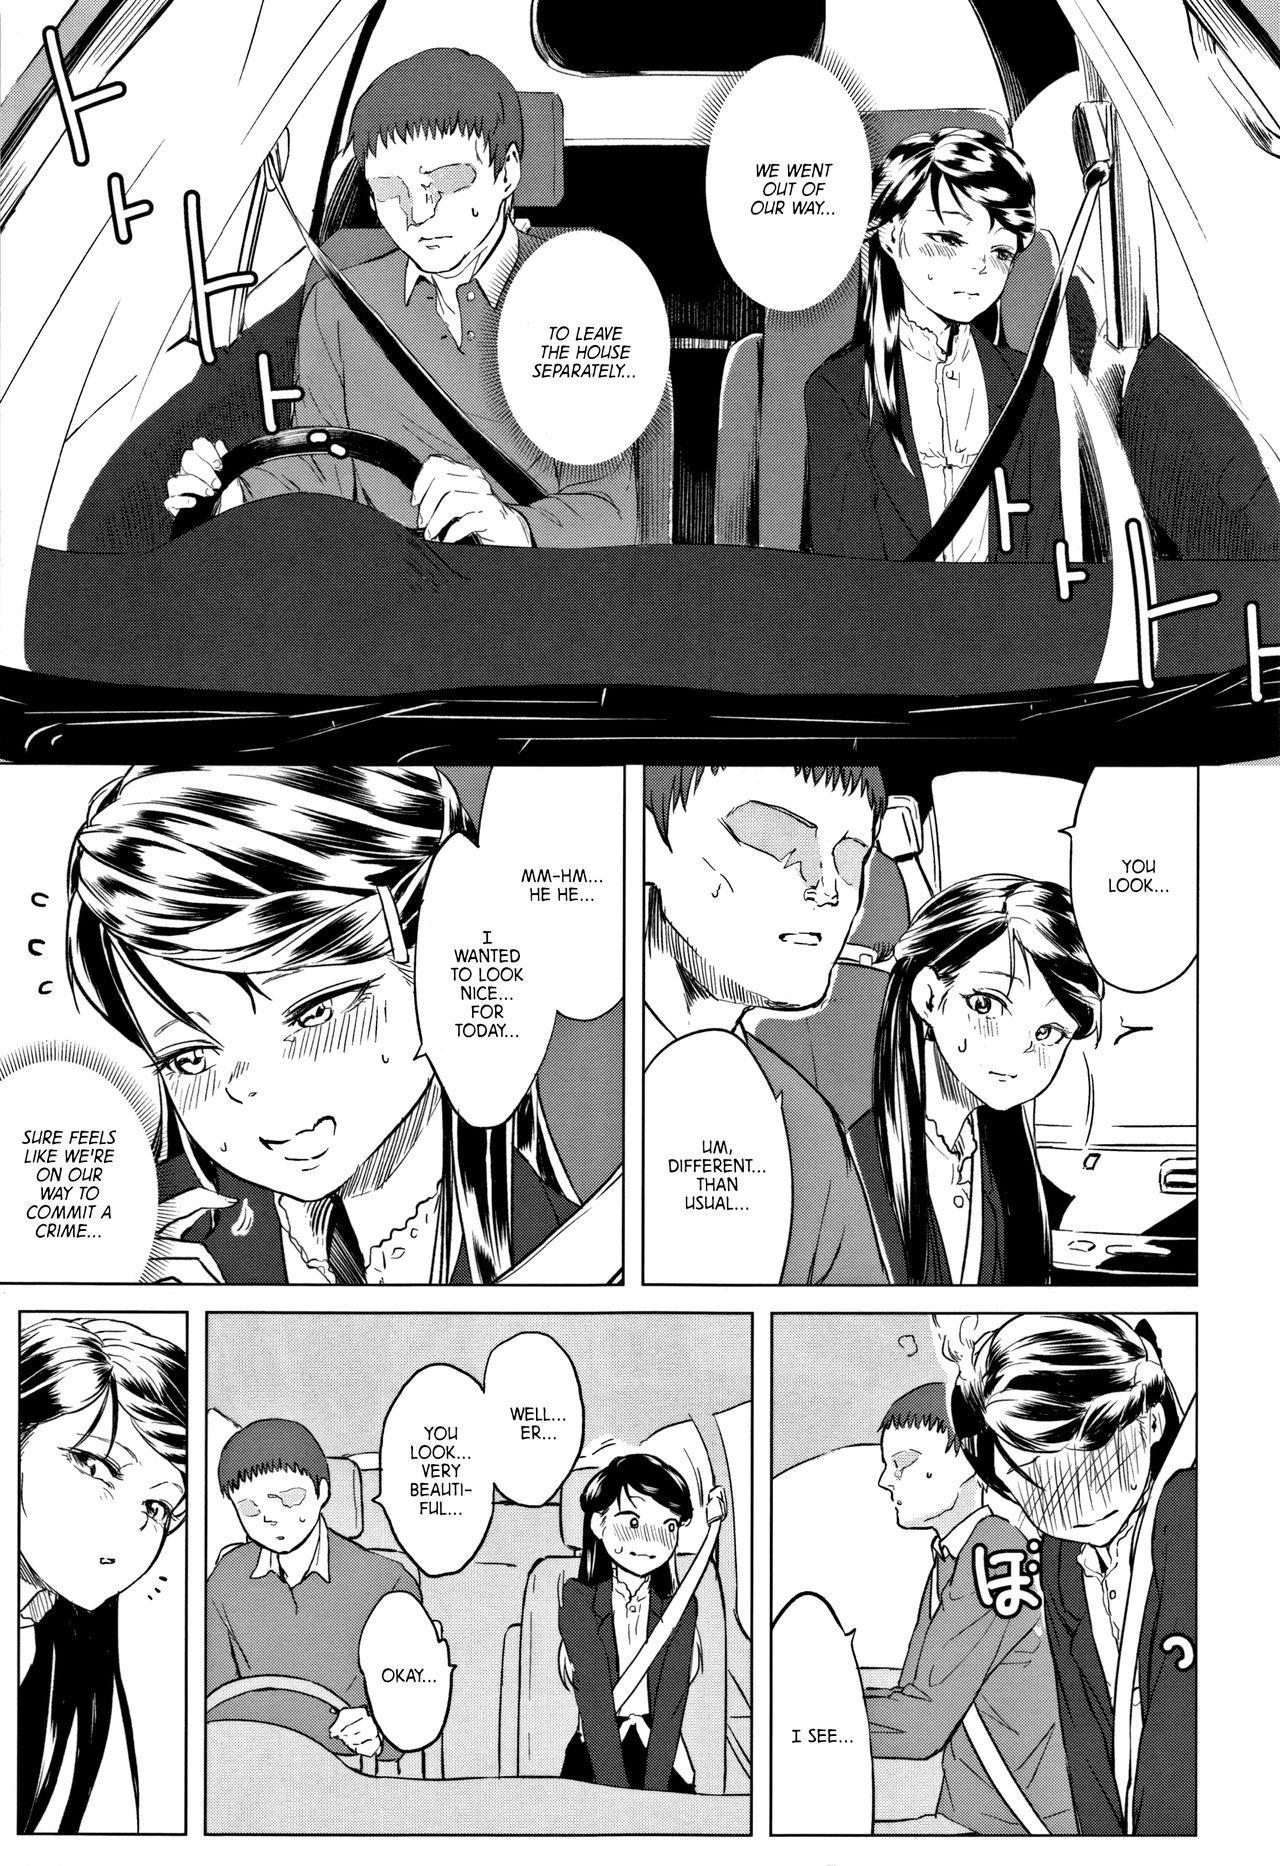 Chichi to Musume no Seiai Hakusho | Father and daughter sex white paper 192